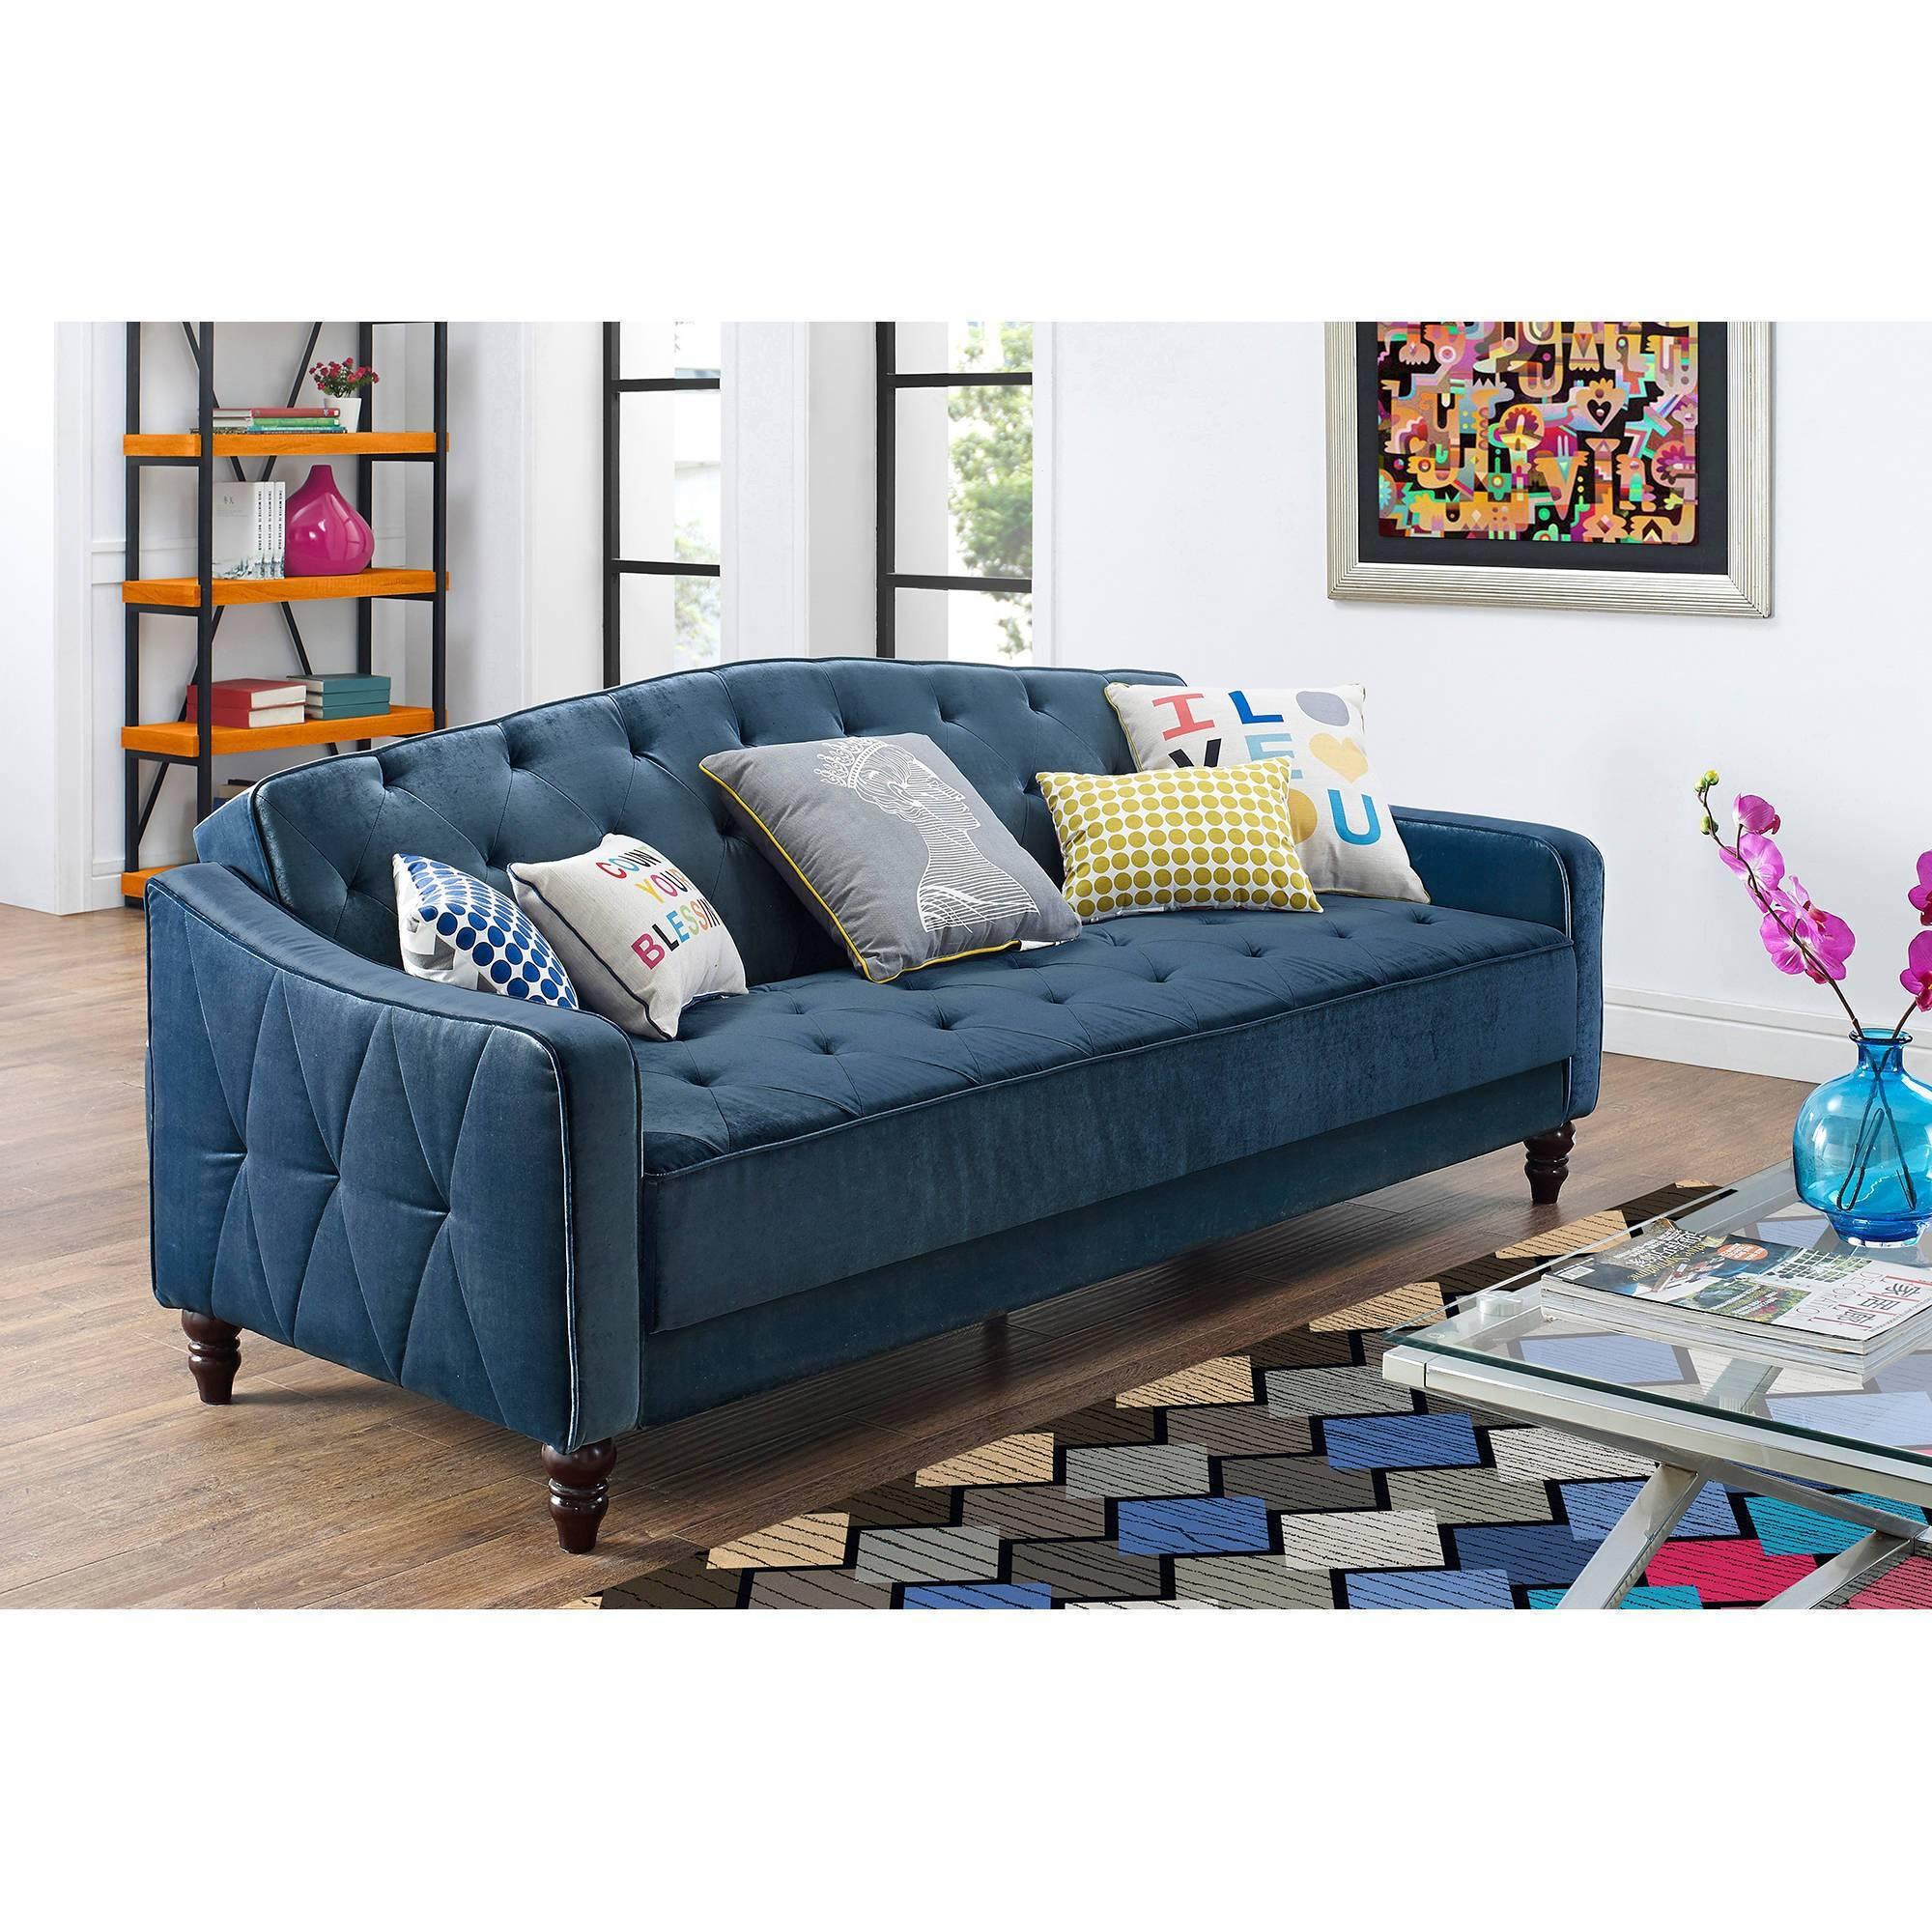 Futons, Futon Beds, Sofa Beds - Walmart in Fulton Sofa Beds (Image 22 of 30)